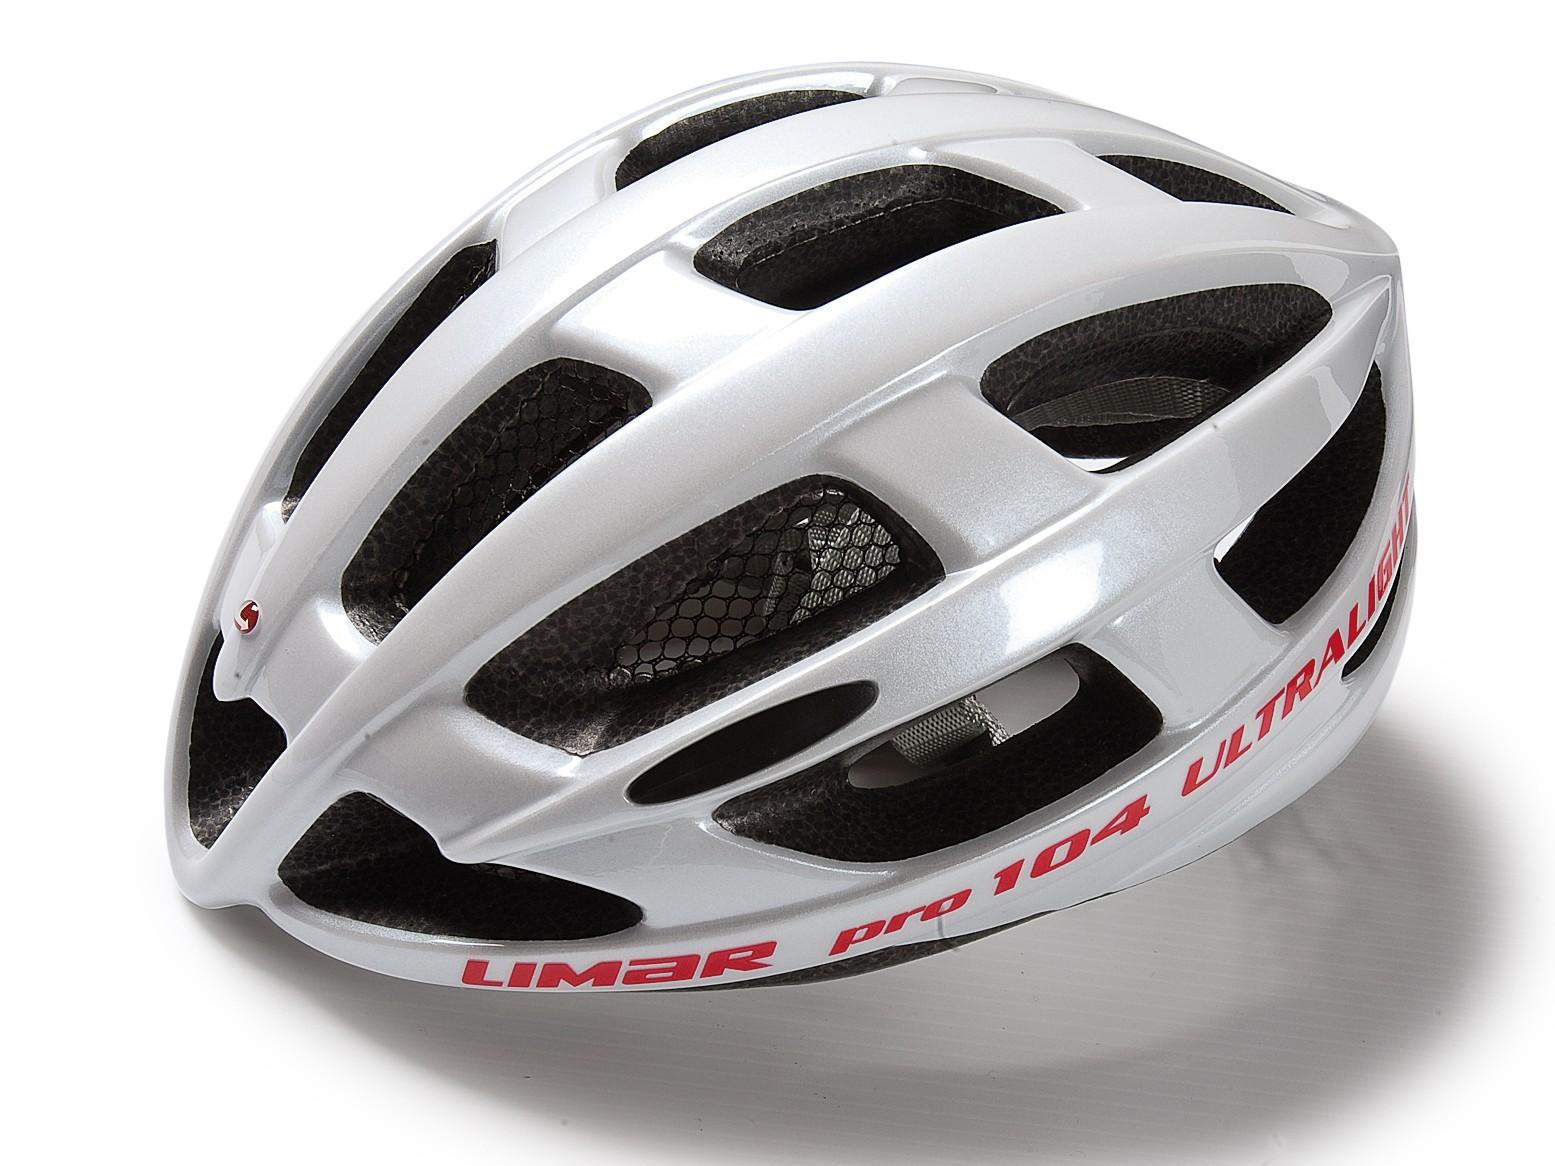 Limar Pro 104 Ultralight helmet